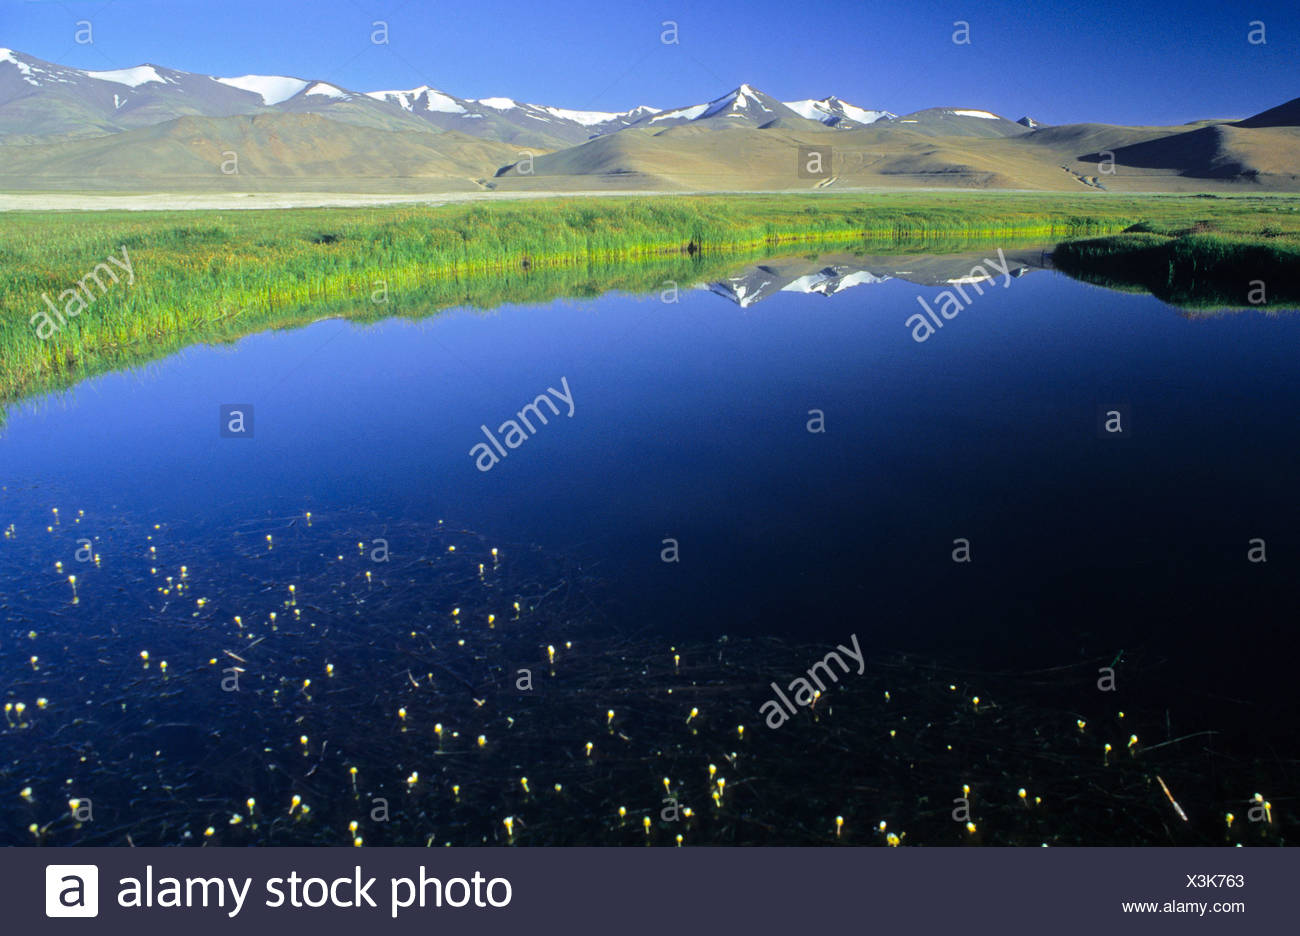 Lake Kar Tso, grassy plateau and snow-covered peaks, elevation of over 4900 metres, Himalayas, Ladakh, India - Stock Image